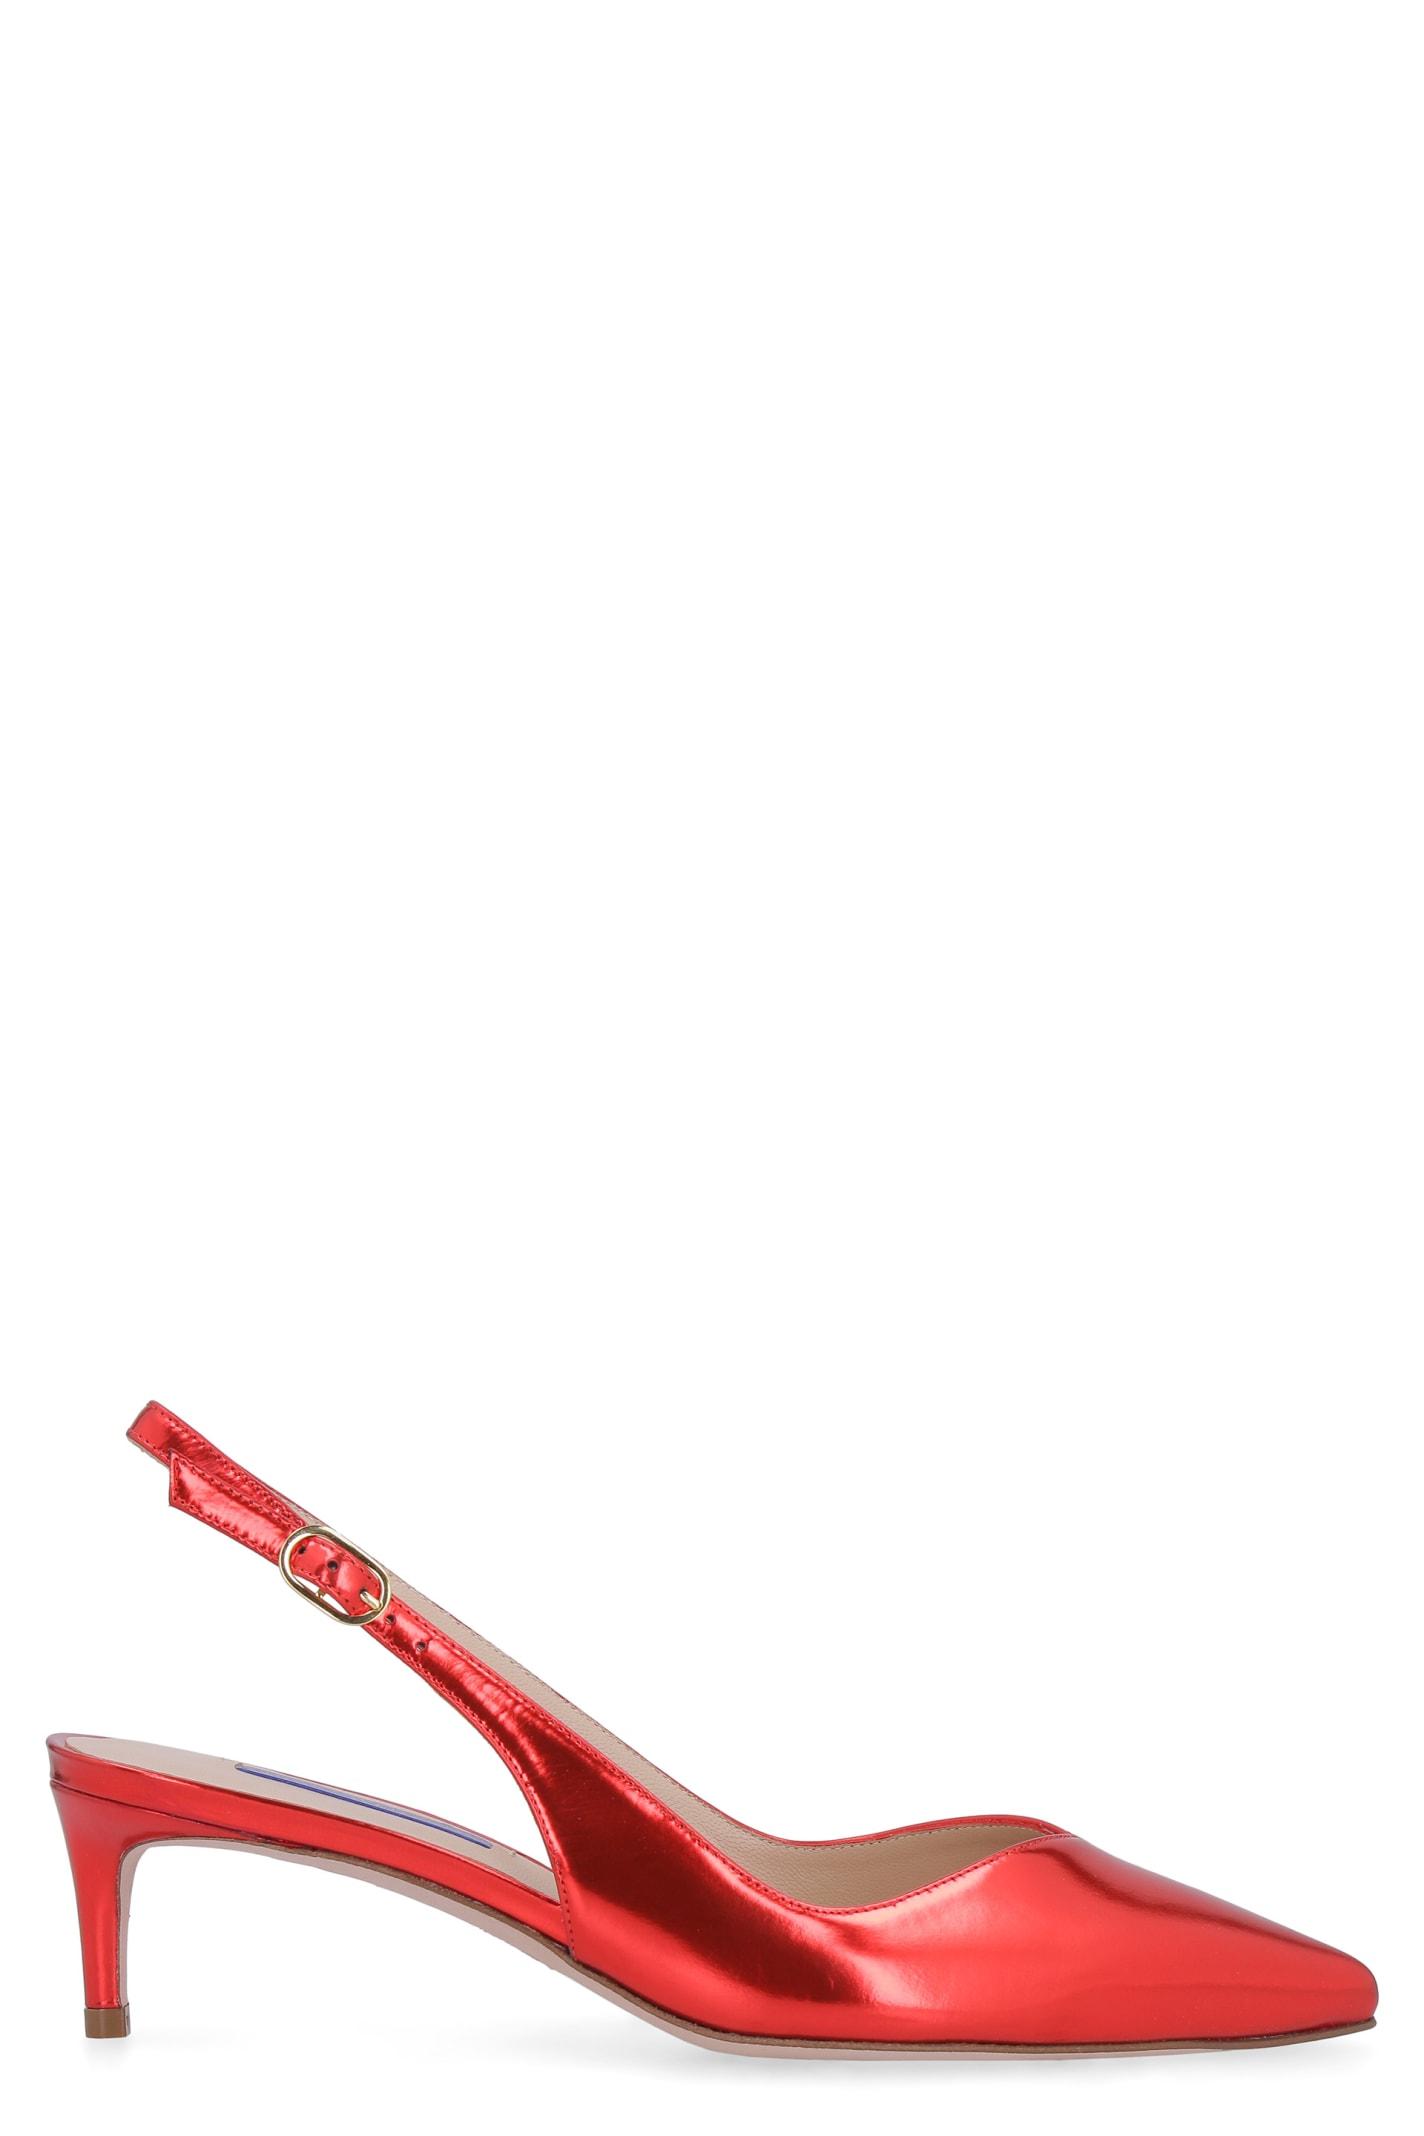 Buy Stuart Weitzman Edith Mirror Look Leather Sling-back online, shop Stuart Weitzman shoes with free shipping